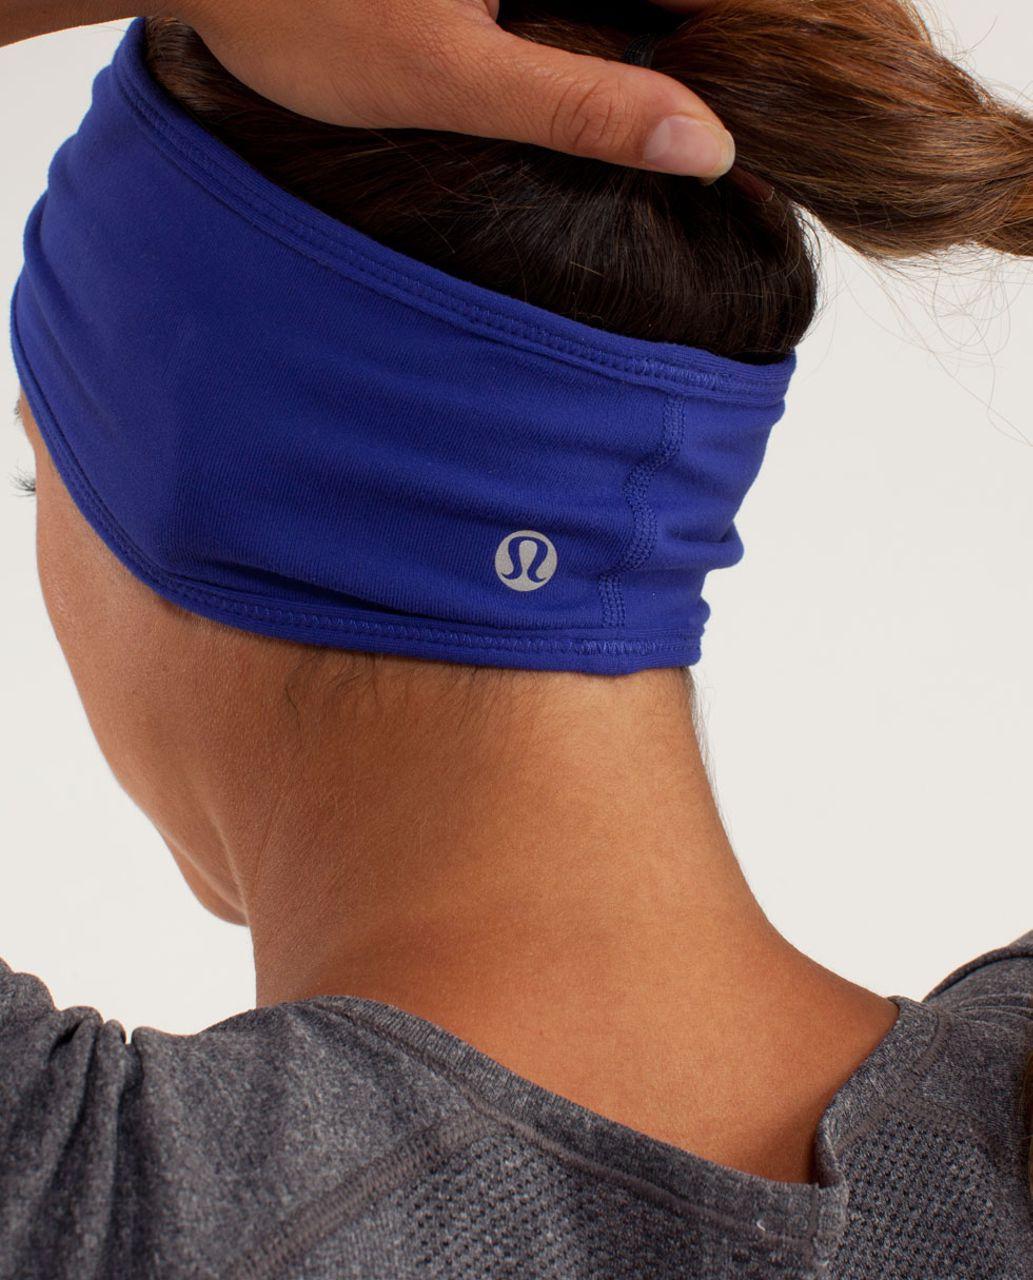 Lululemon Brisk Run Headband - Pigment Blue / Tonka Stripe Pigment Blue / Heathered Pigment Blue